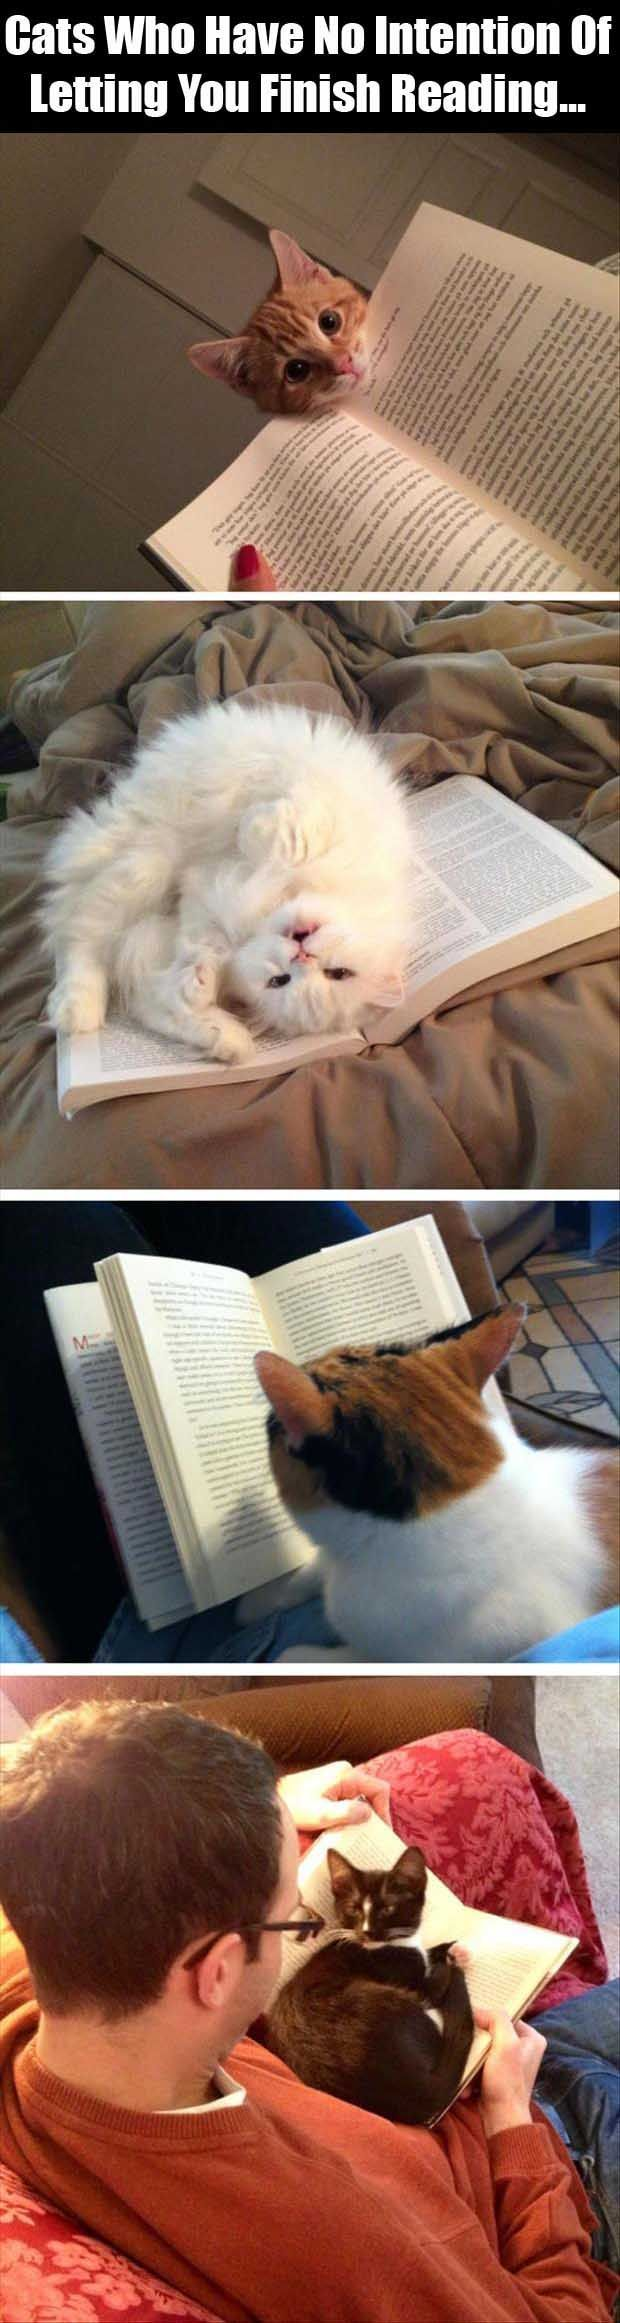 LOL cat images (3:57:58 PM PST Saturday, March 7, 2015) – 10 pics: